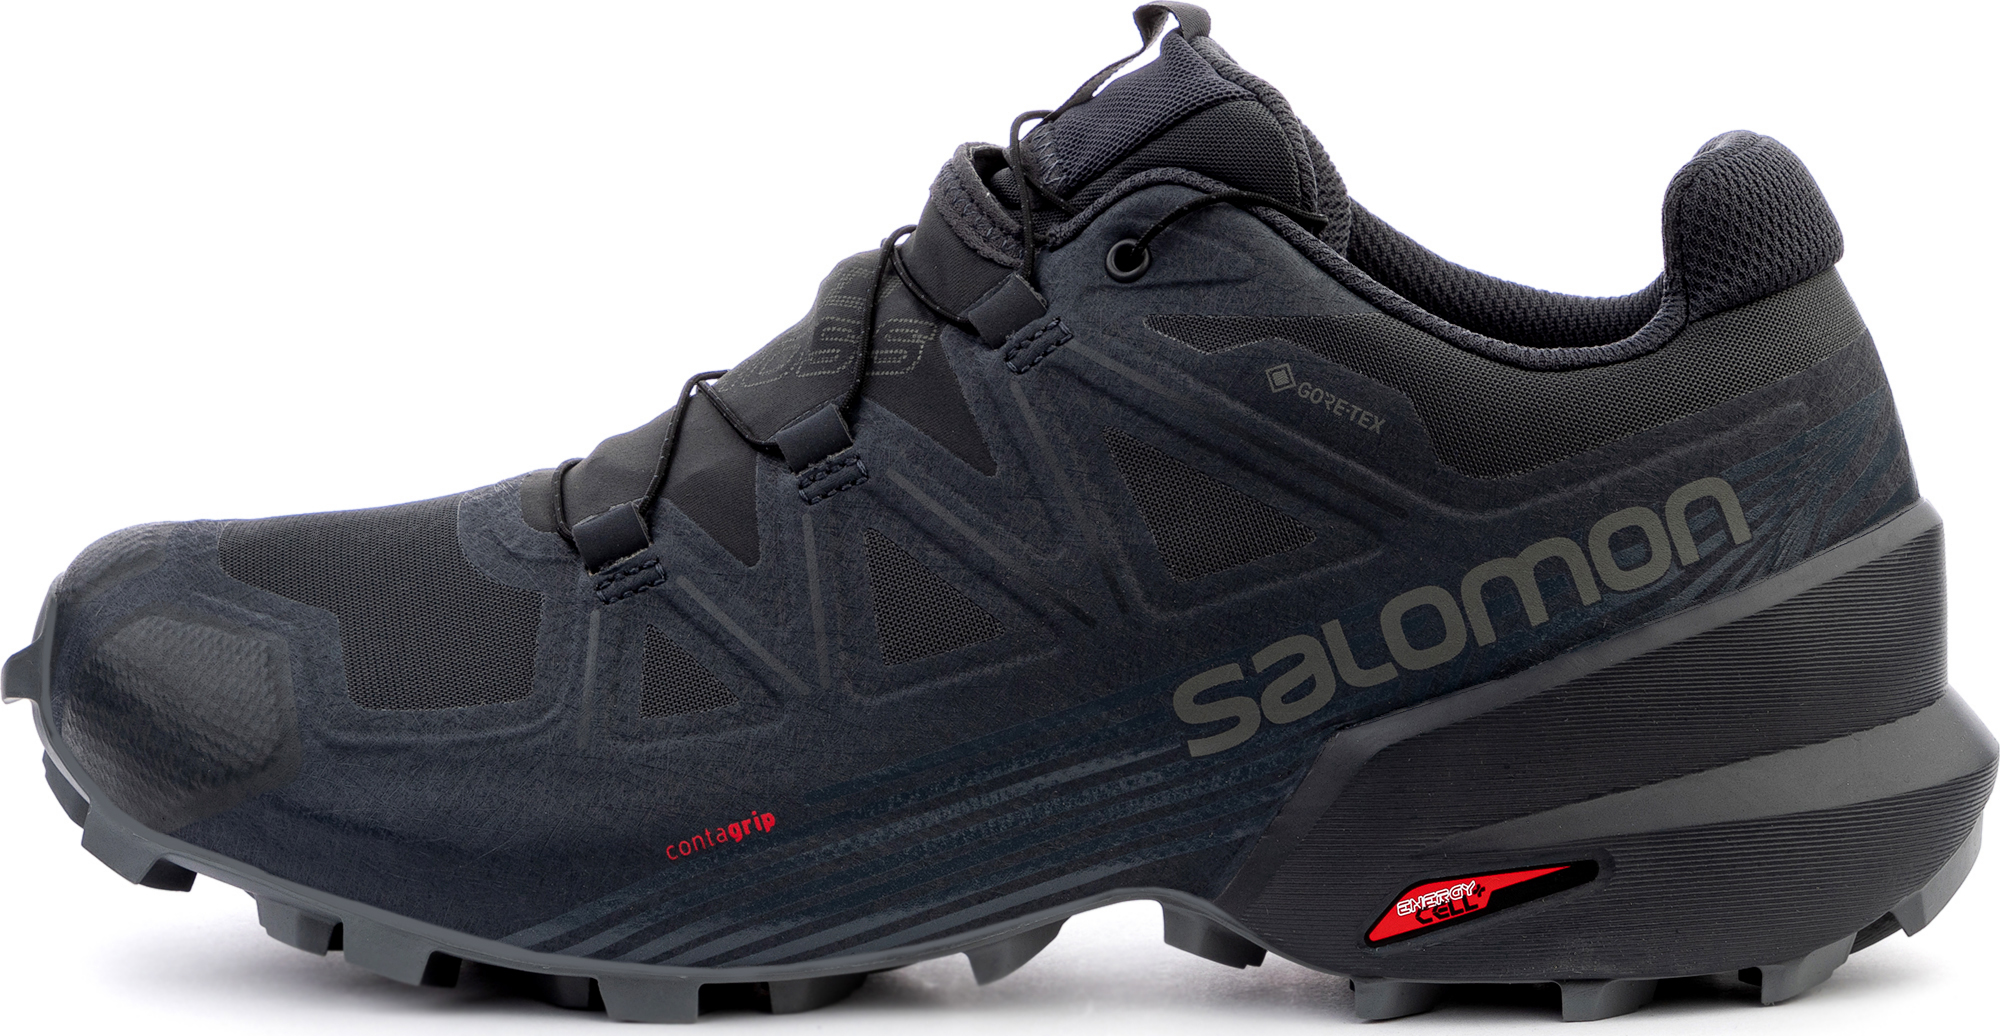 Salomon Кроссовки мужские Speedcross 5 GTX Nocturne, размер 45